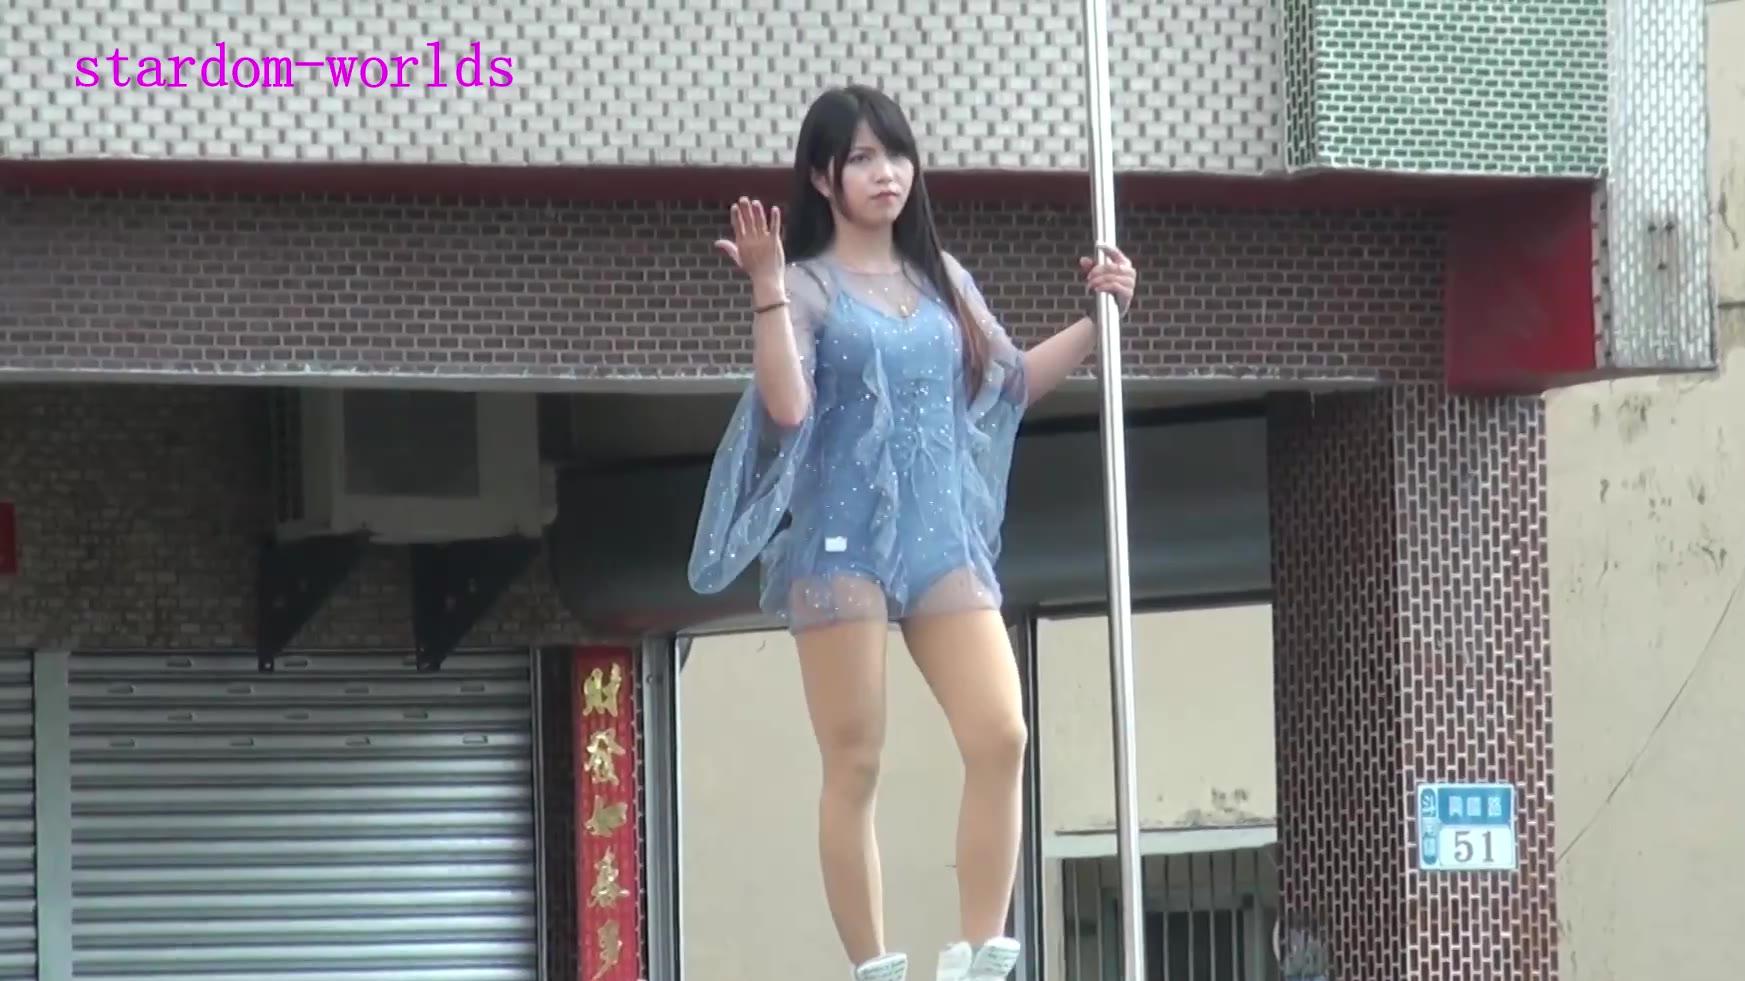 Dance舞蹈 美女小姐姐热舞 20.7.11-part2